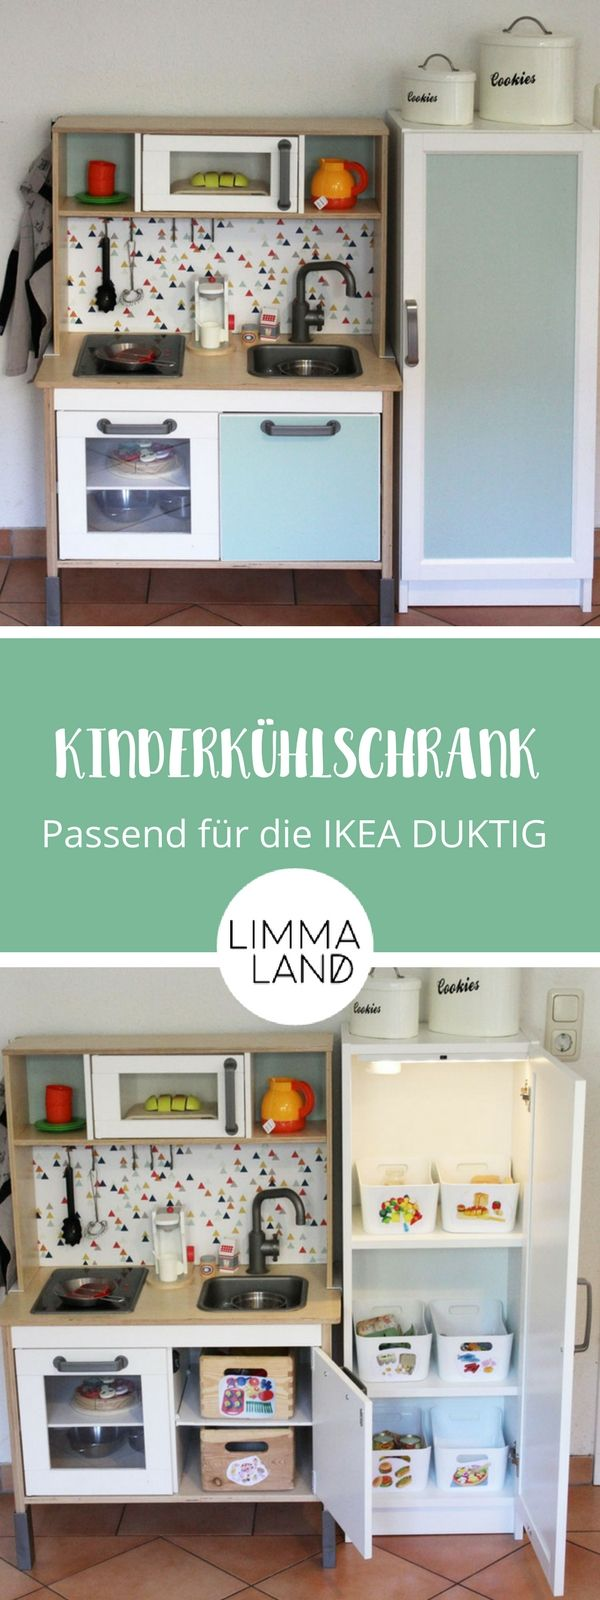 IKEA Kinderkühlschrank selber bauen: Passend zur DUKTIG Kinderküche